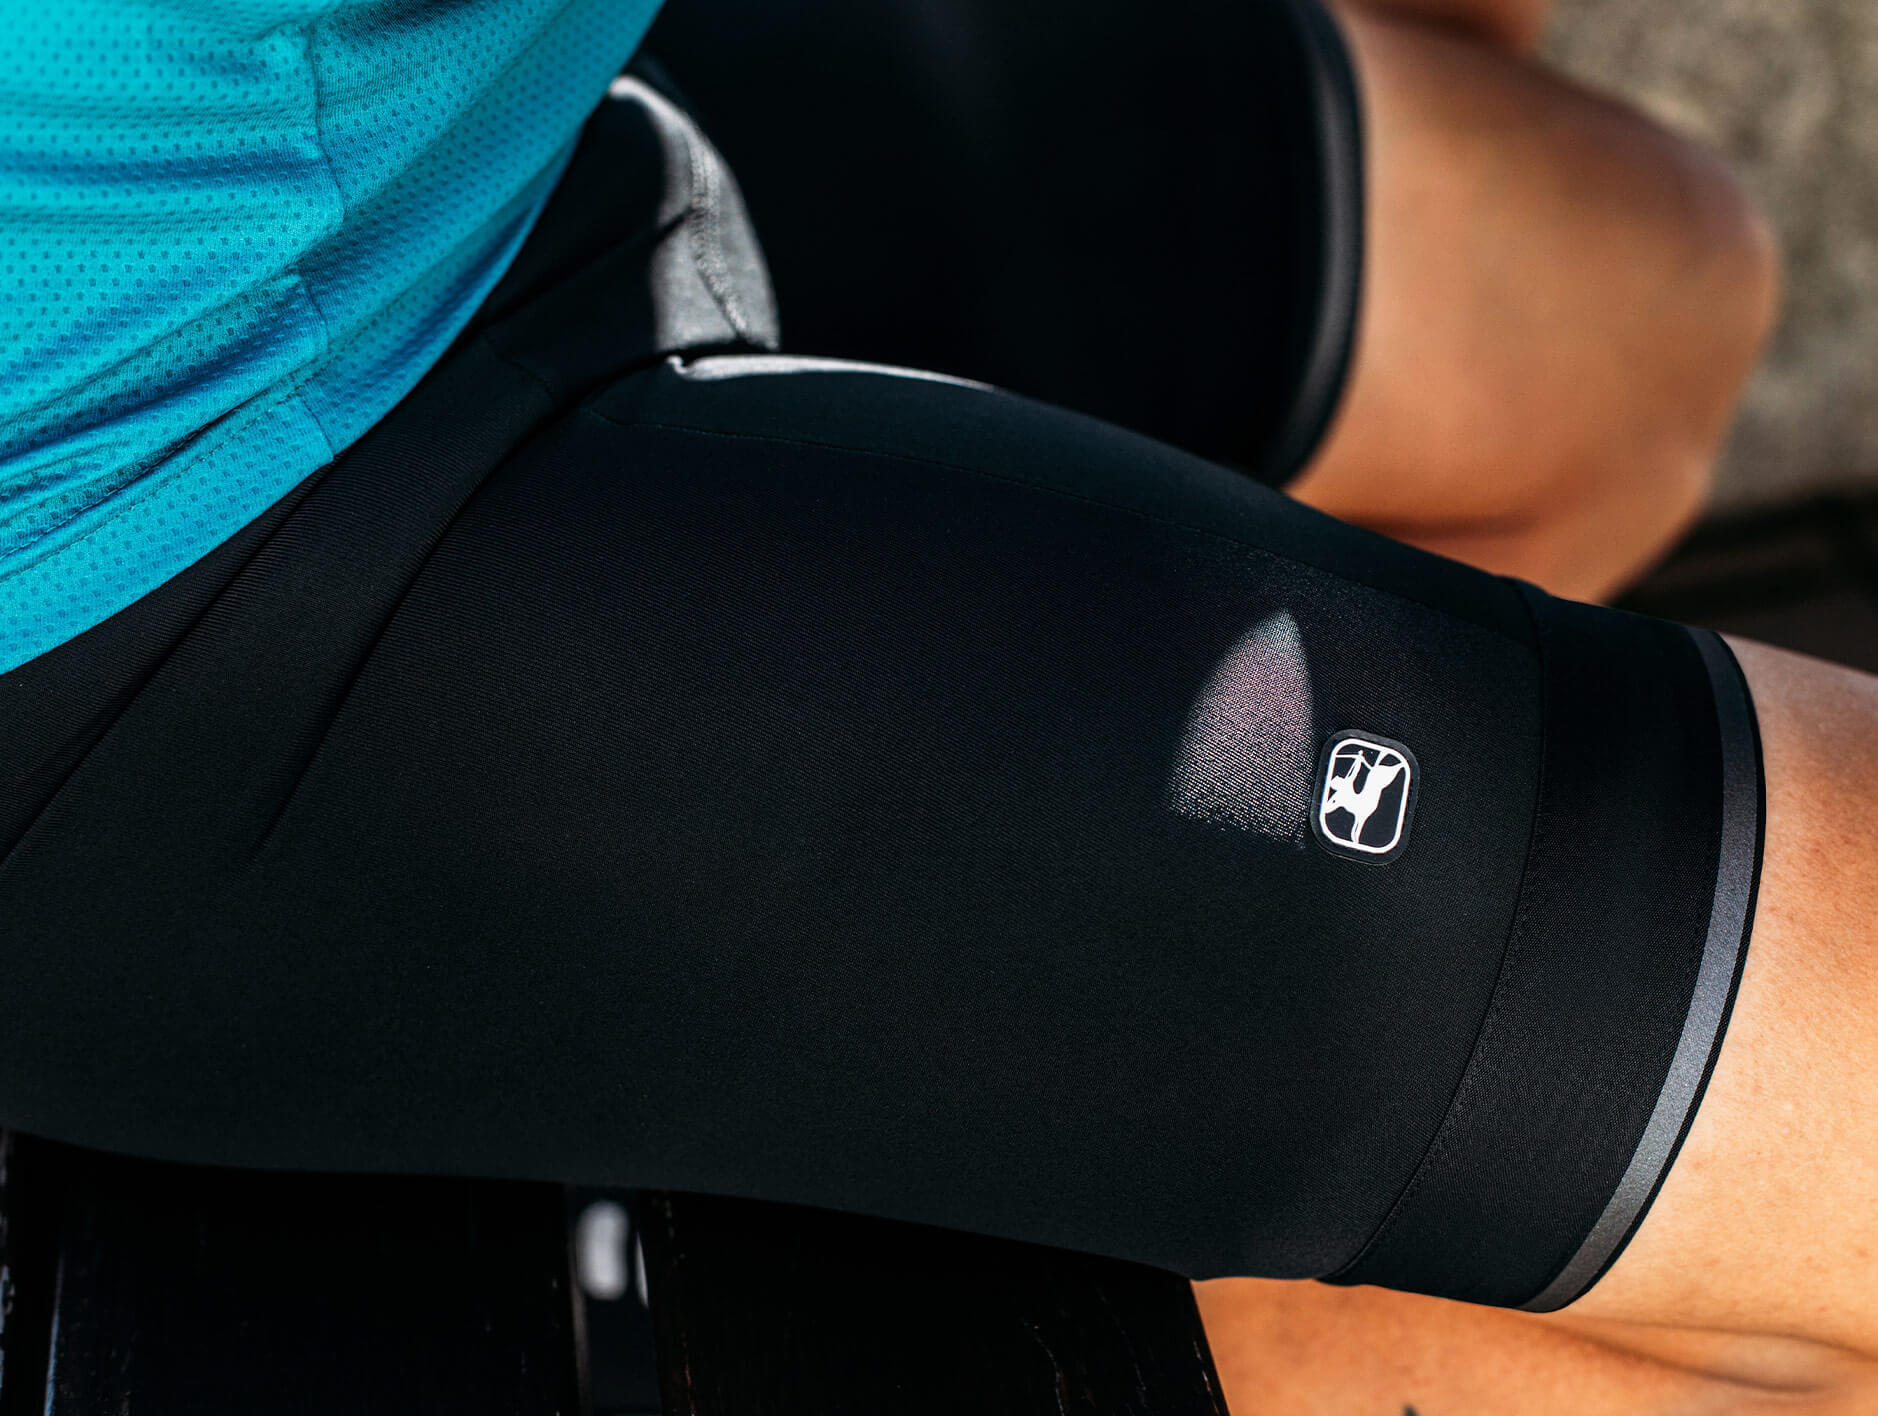 giordana-cycling-bib-short-guide-fusion-large-1-new